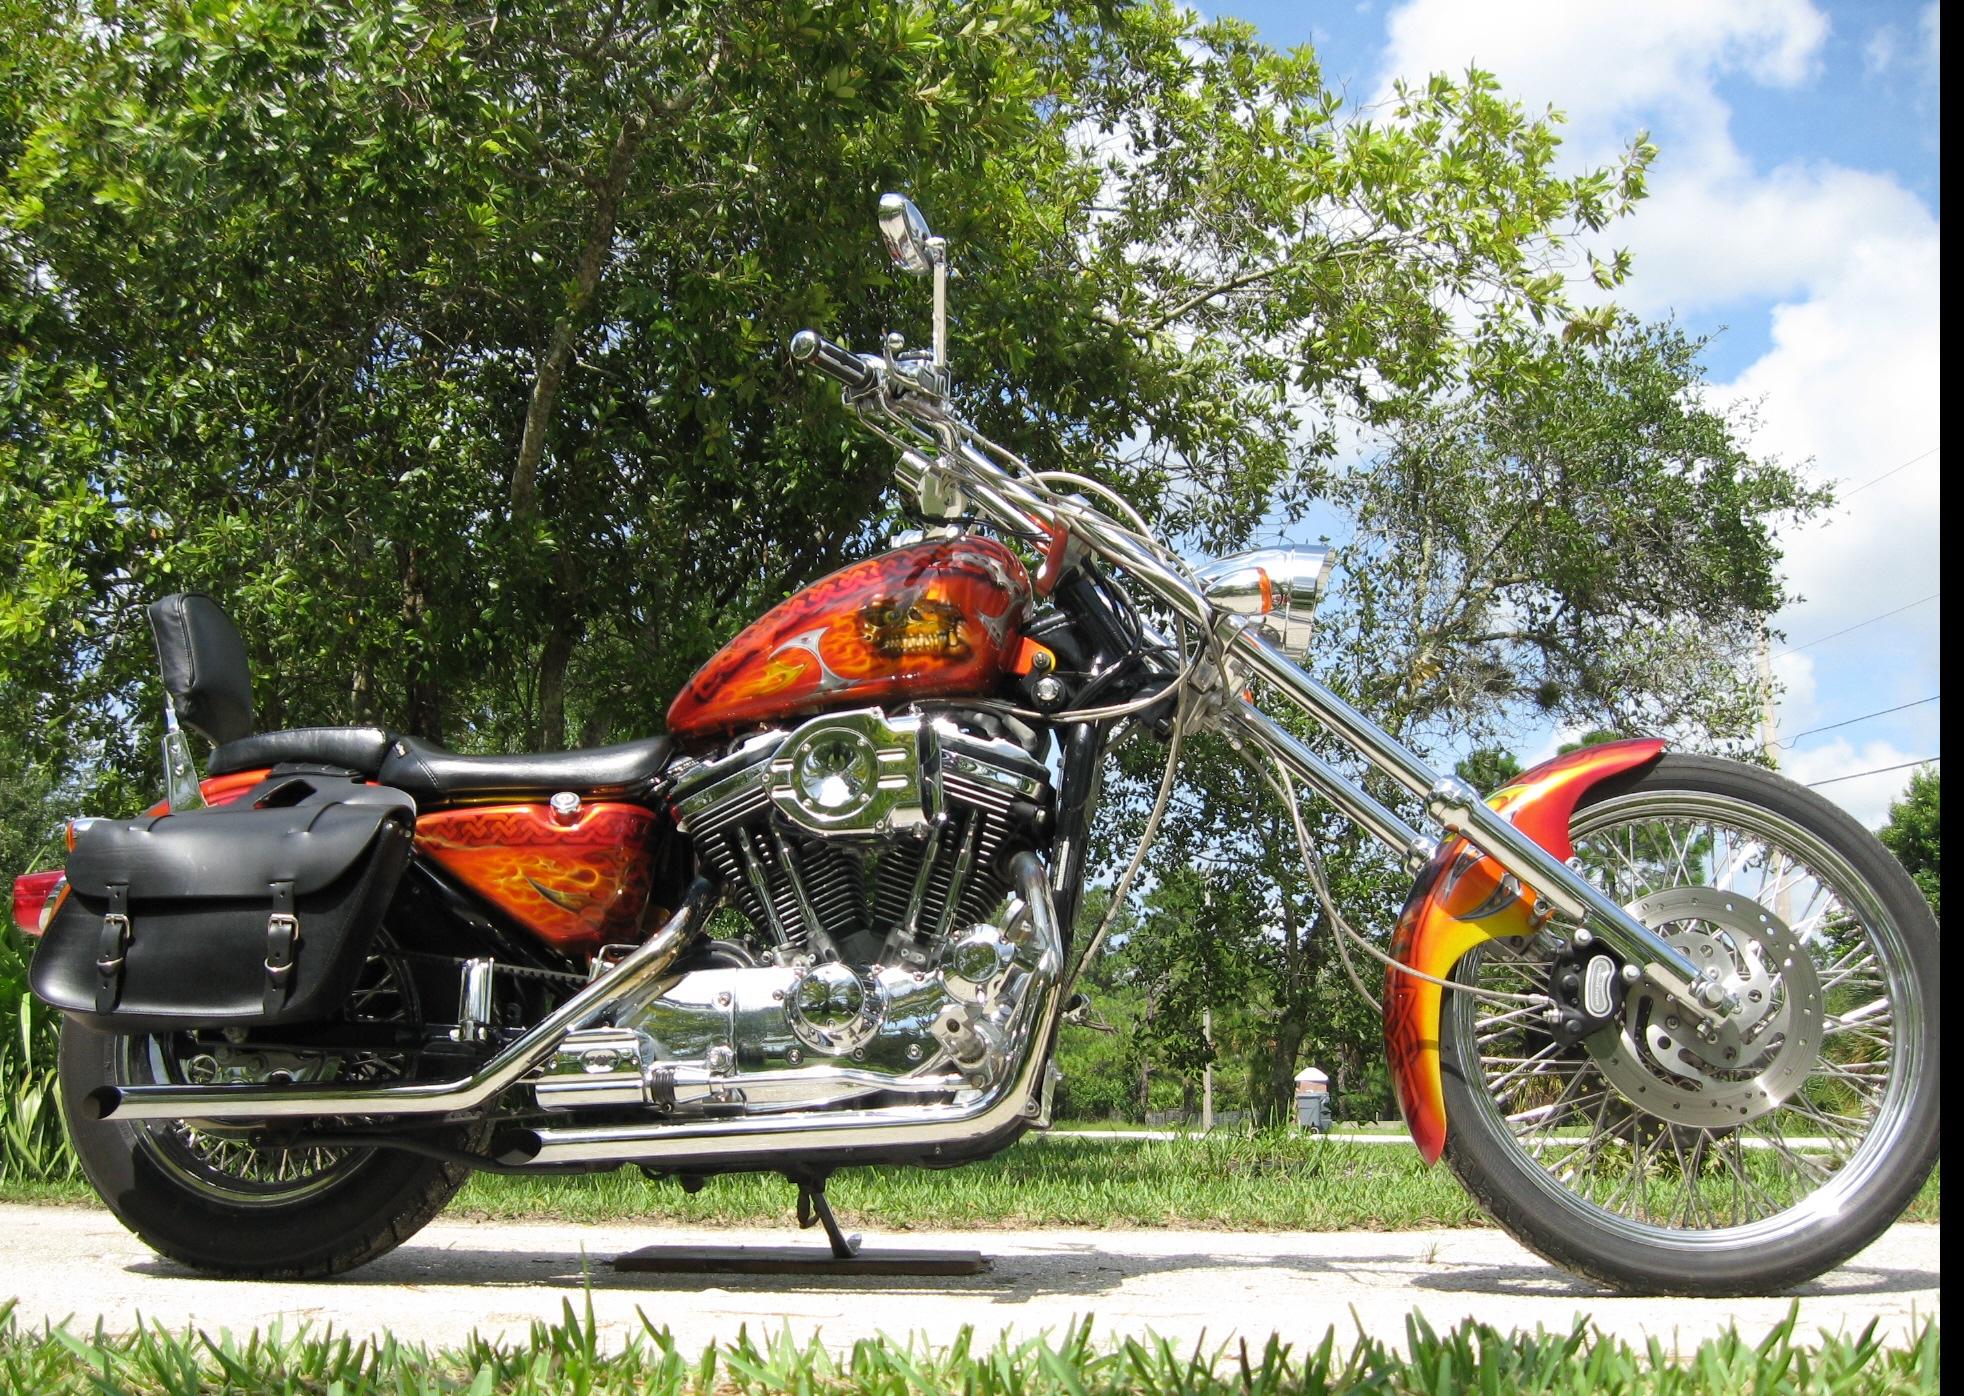 Motorcycle-2003-Harley-Davidson-Sportster-Full-Bike